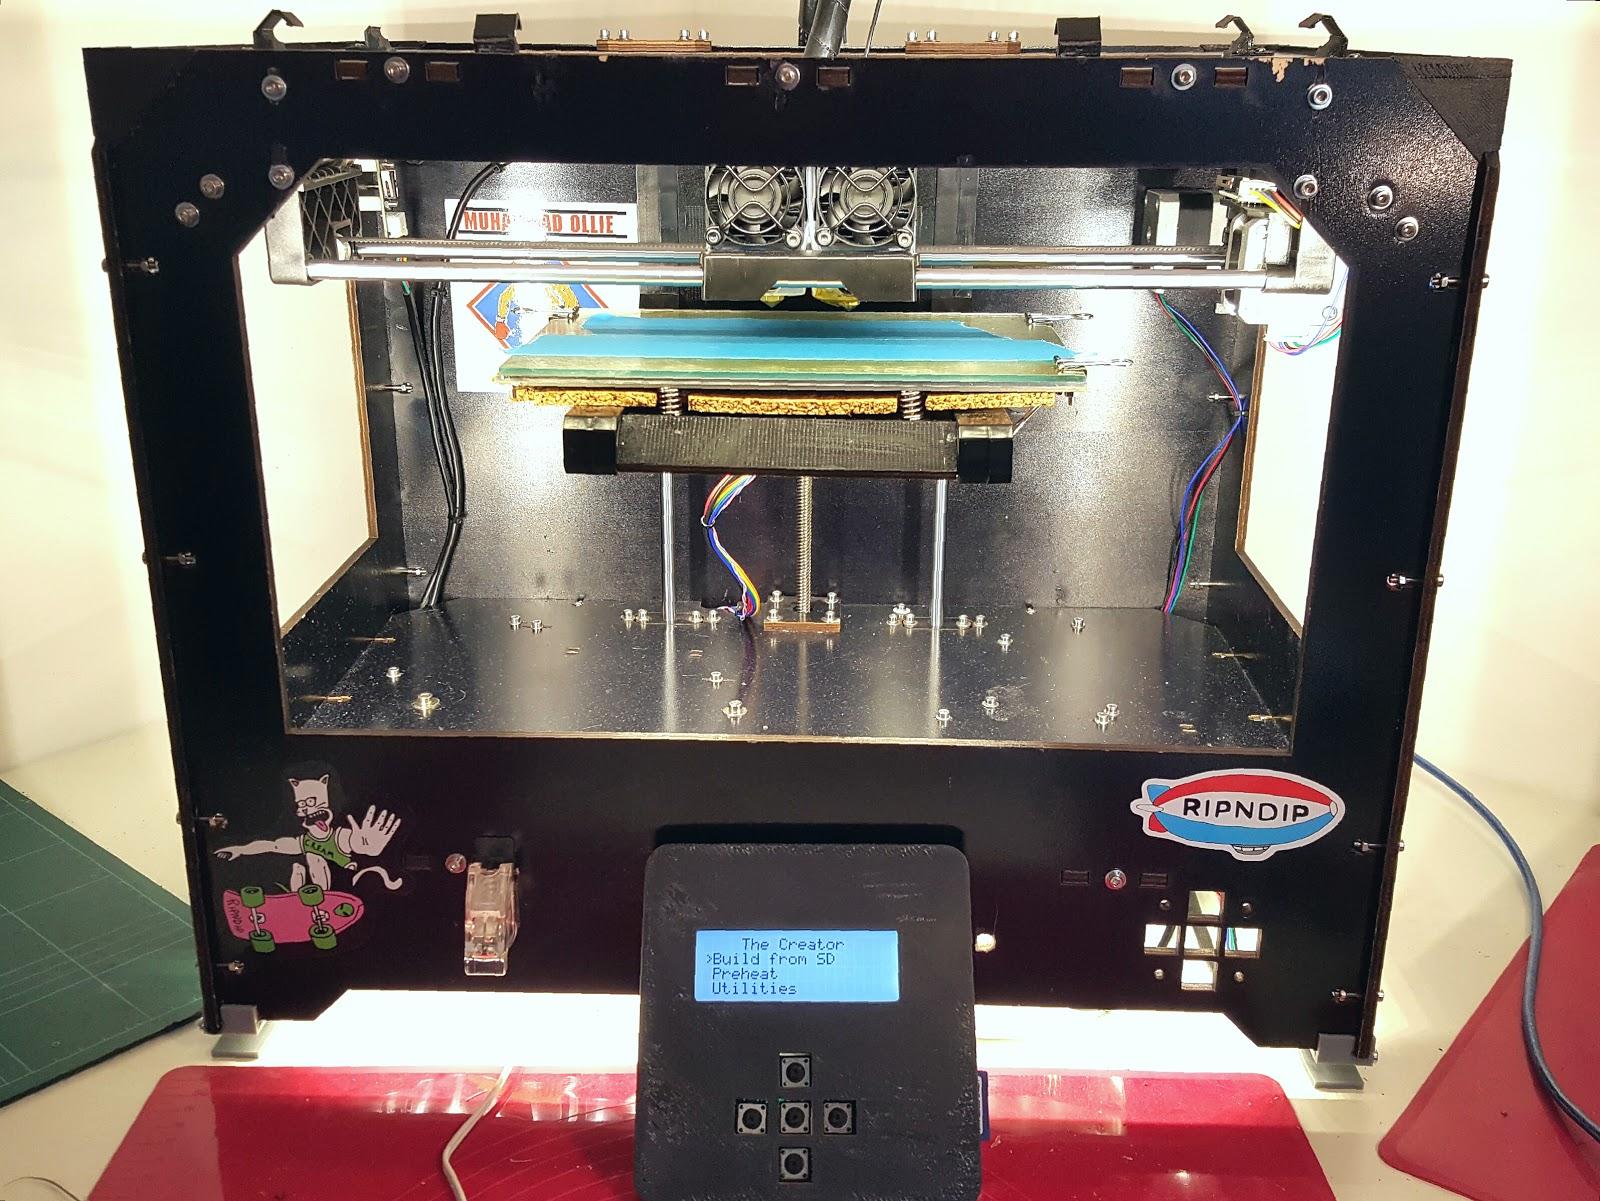 daftmike's blog: CTC Bizer Duplicator... My new 3D printer